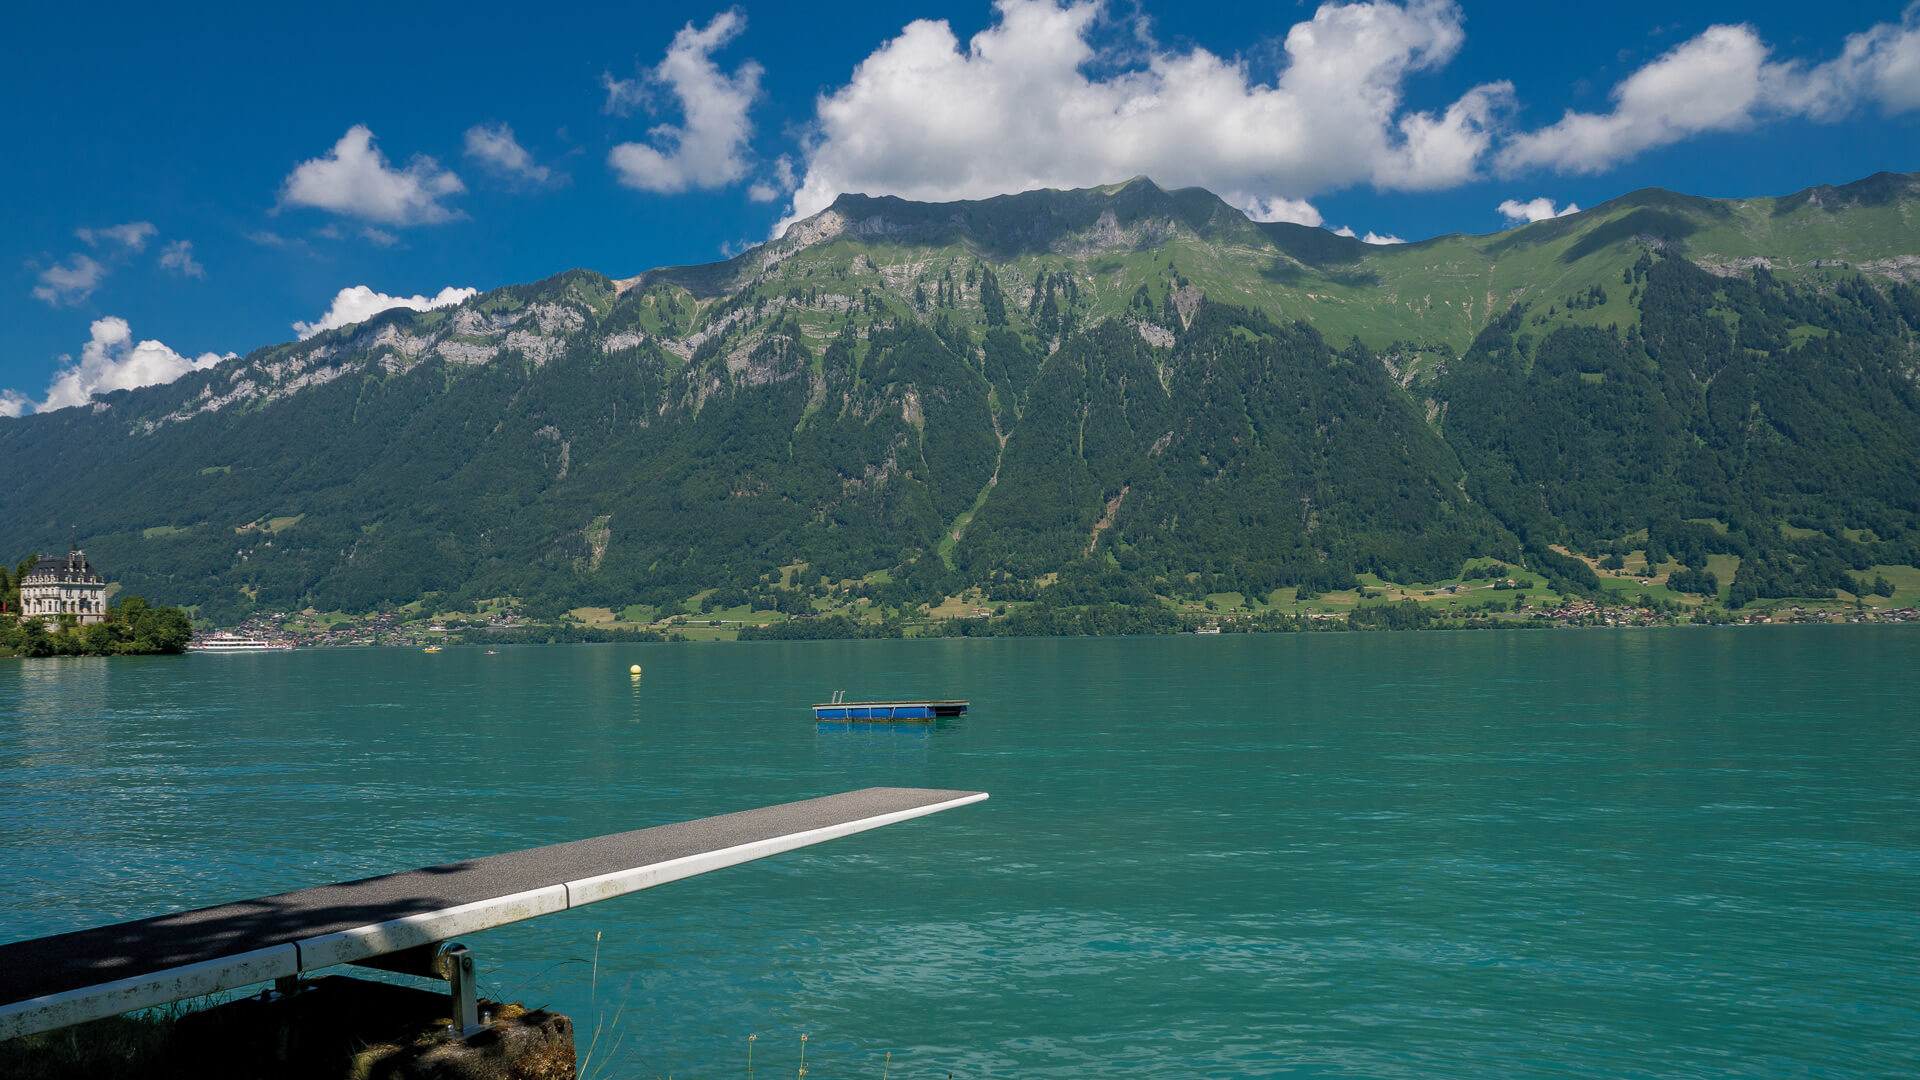 iseltwald-strandbad-sommer-sprungbrett-bergkulisse-augstmatthorn